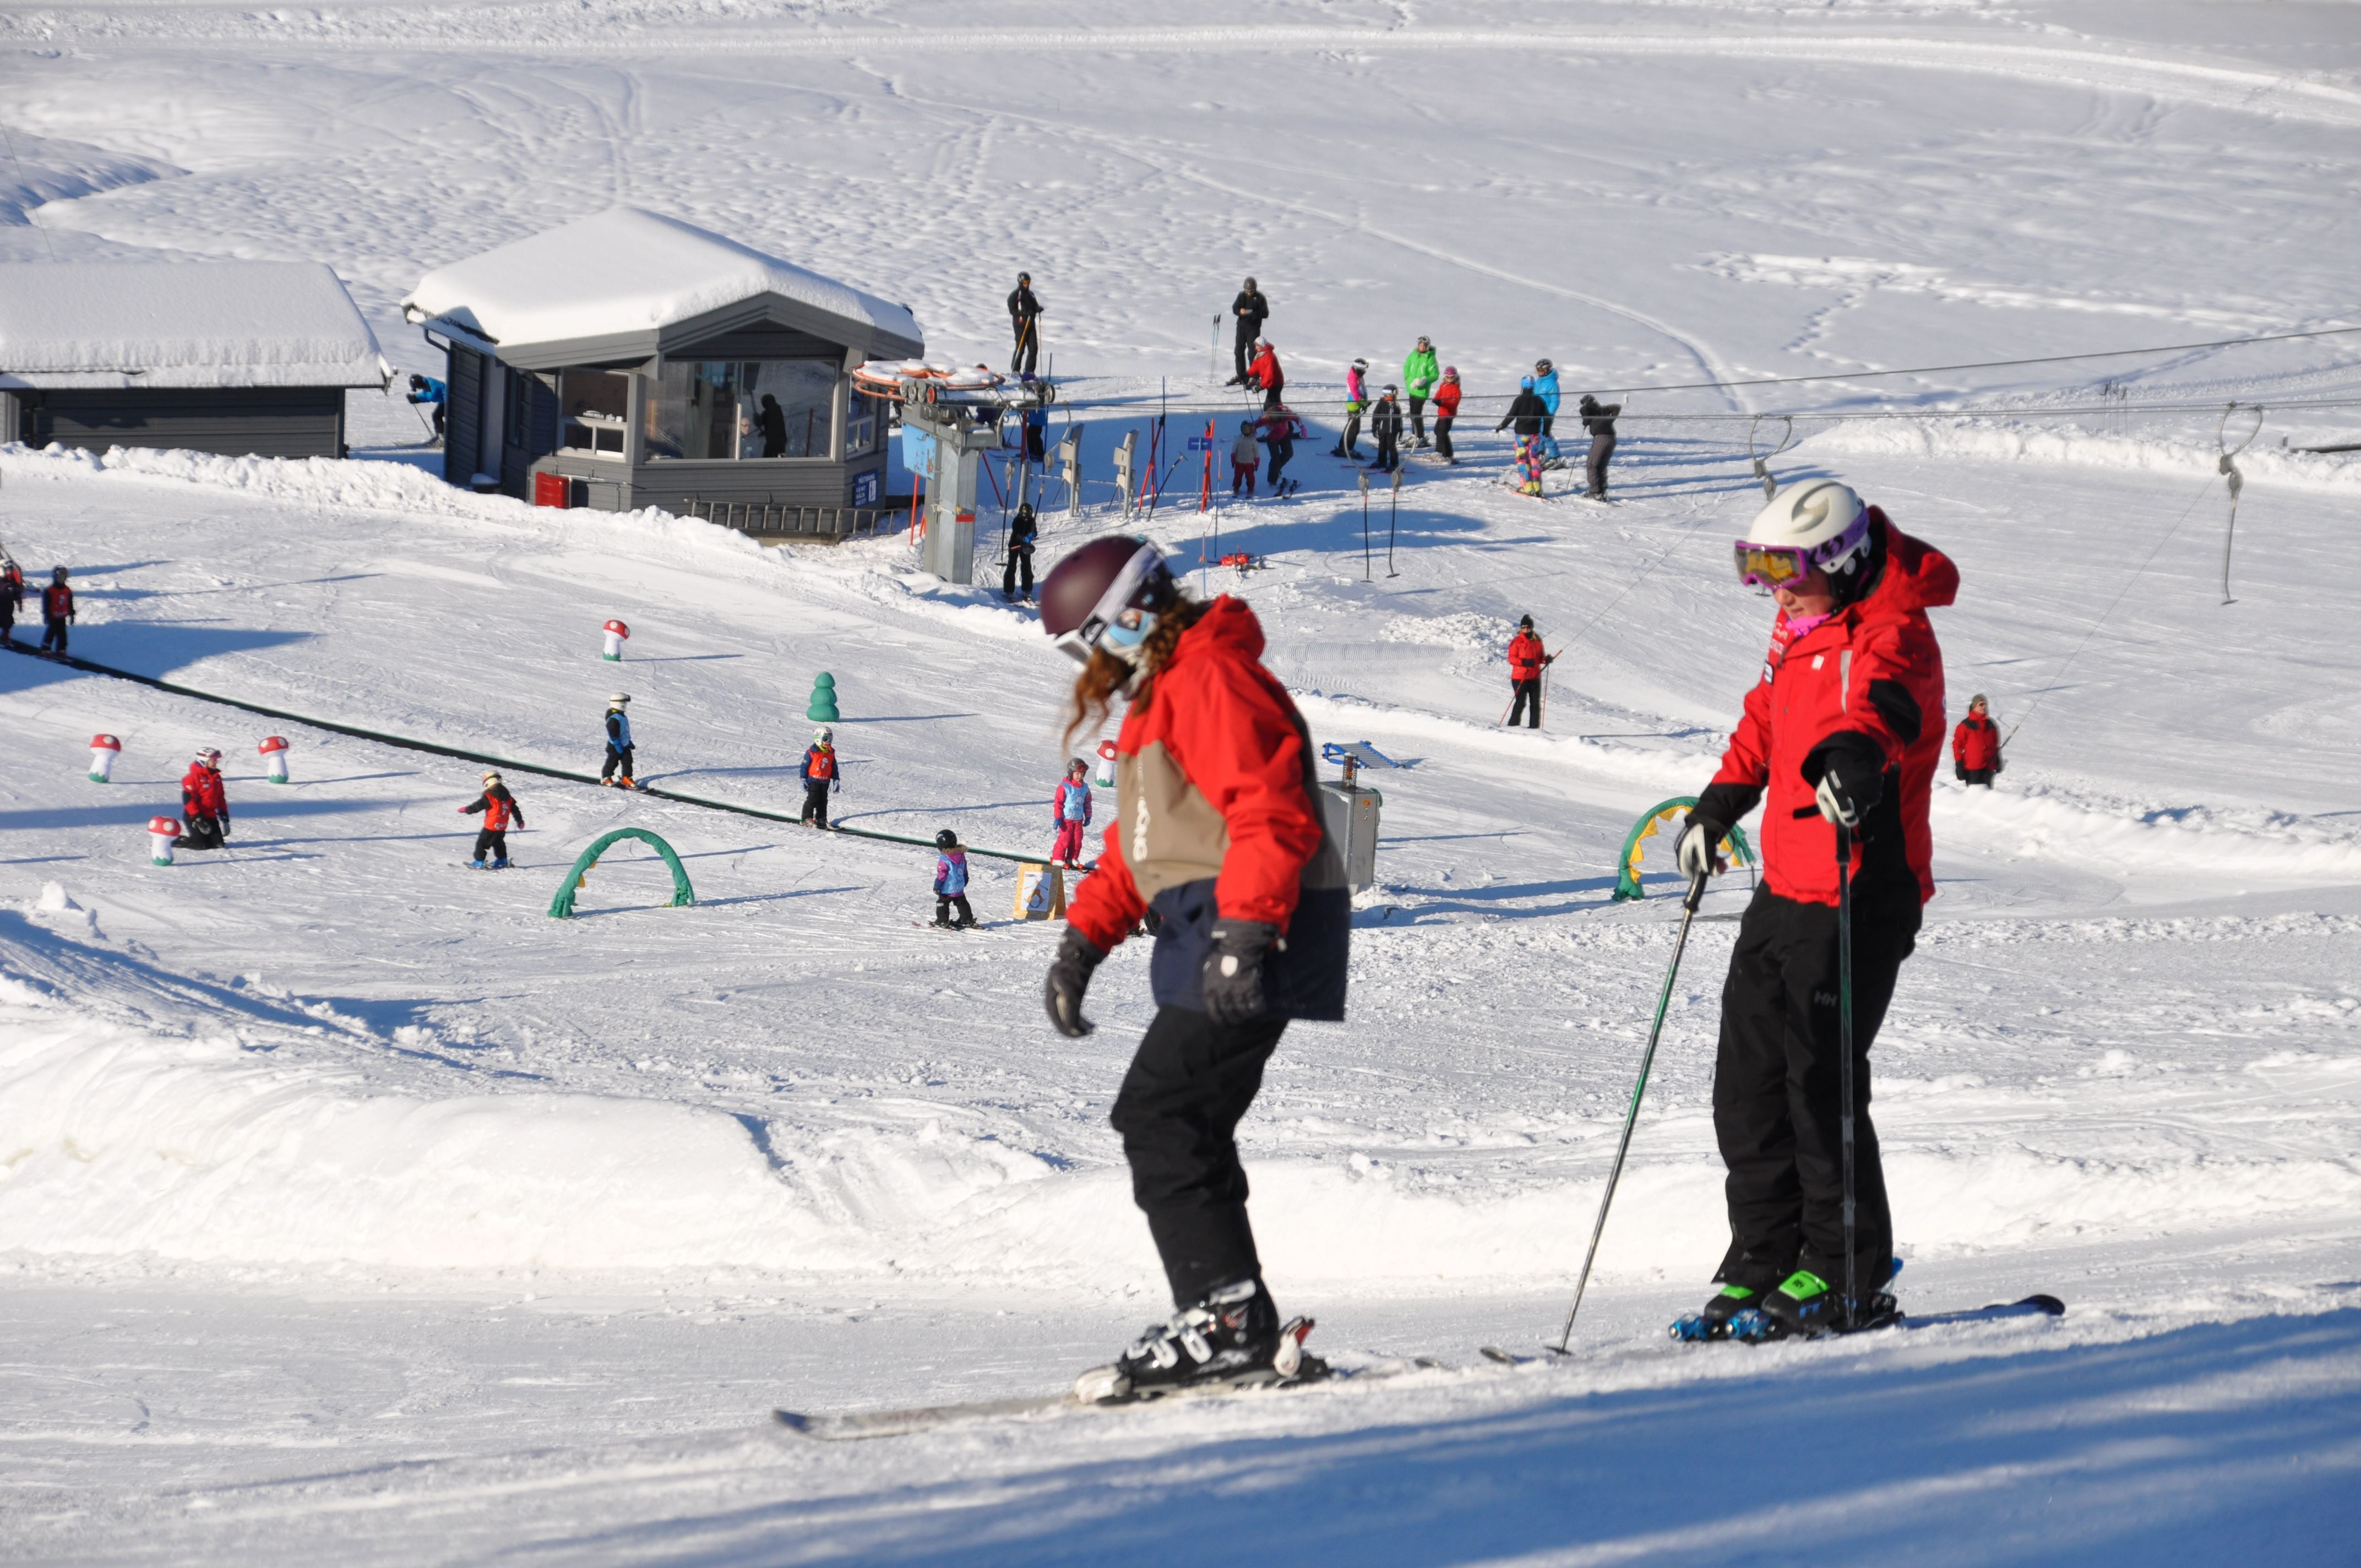 Hafjell Alpinsenter